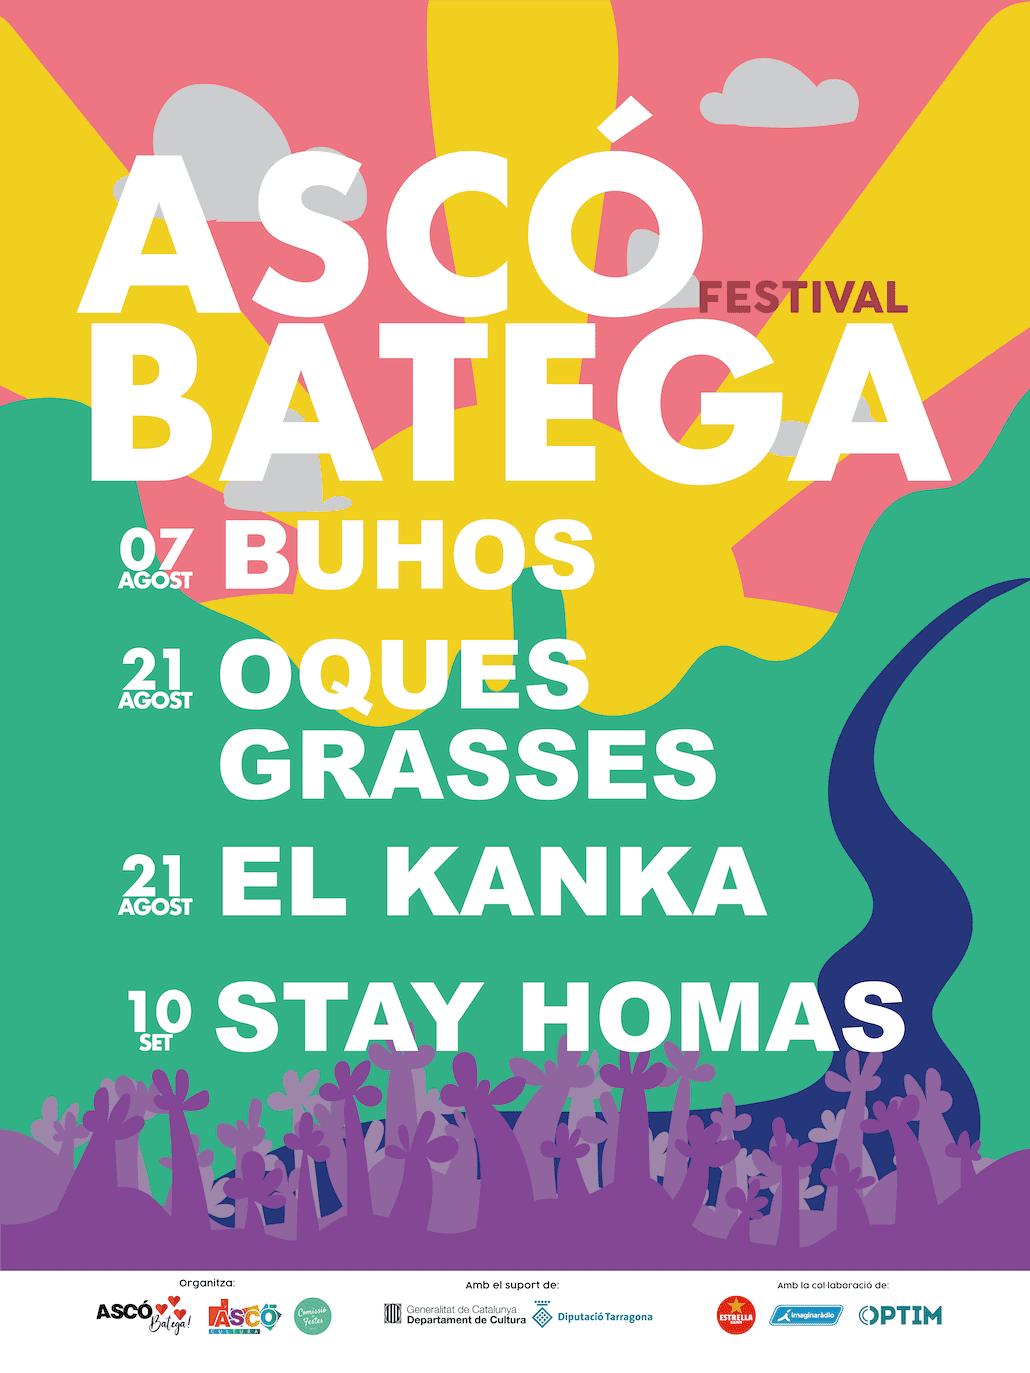 Festival Ascó Batega 2021